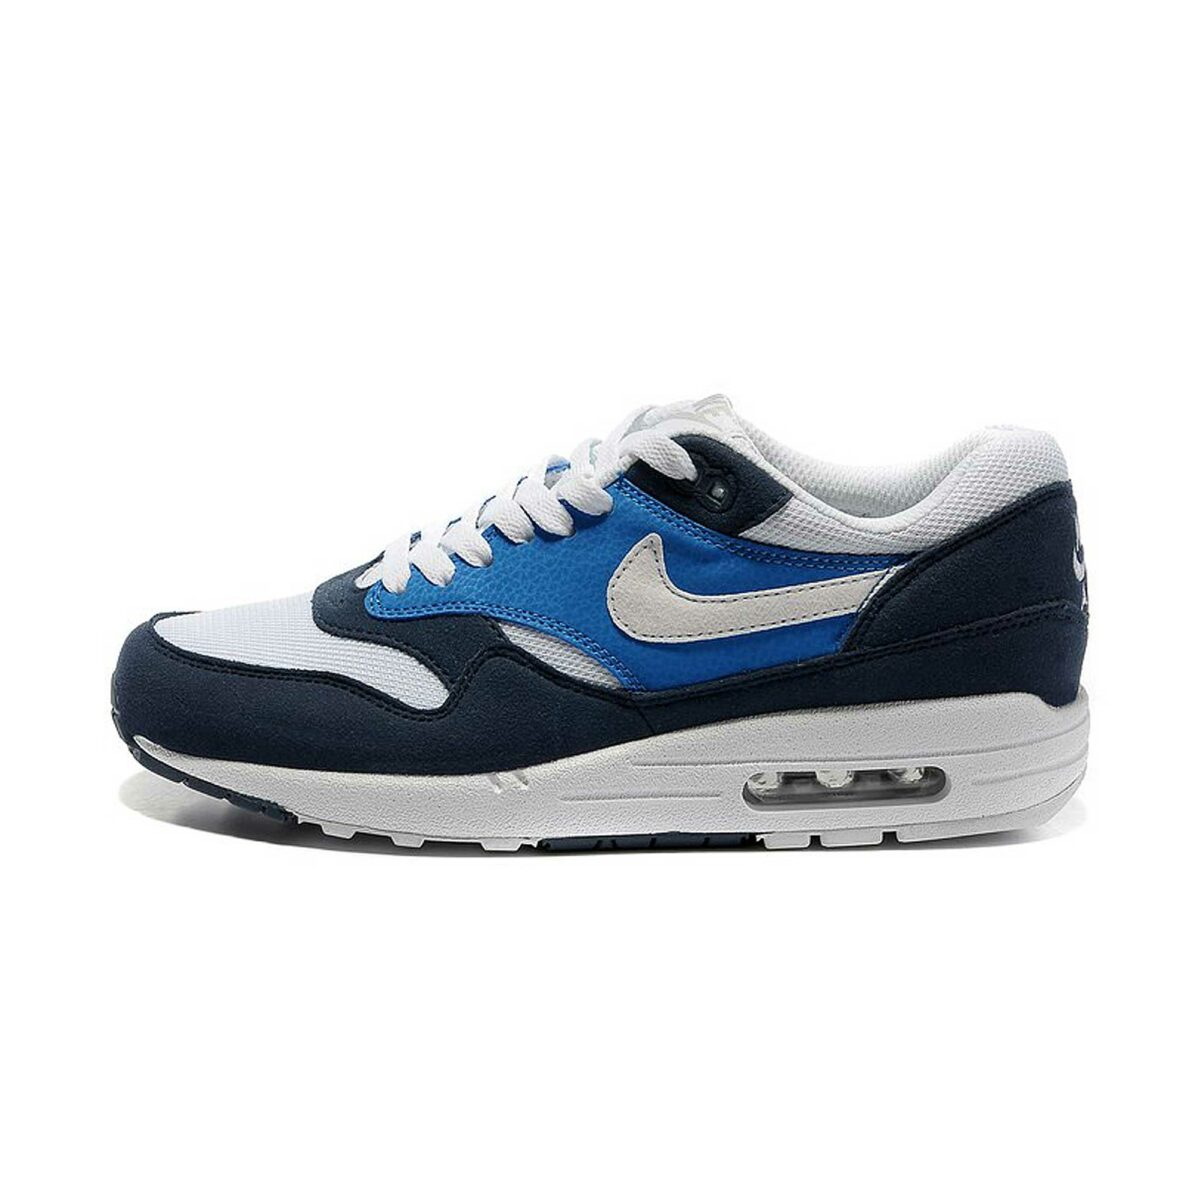 Интернет магазин Nike Air Max 1 87 Vivid Blue